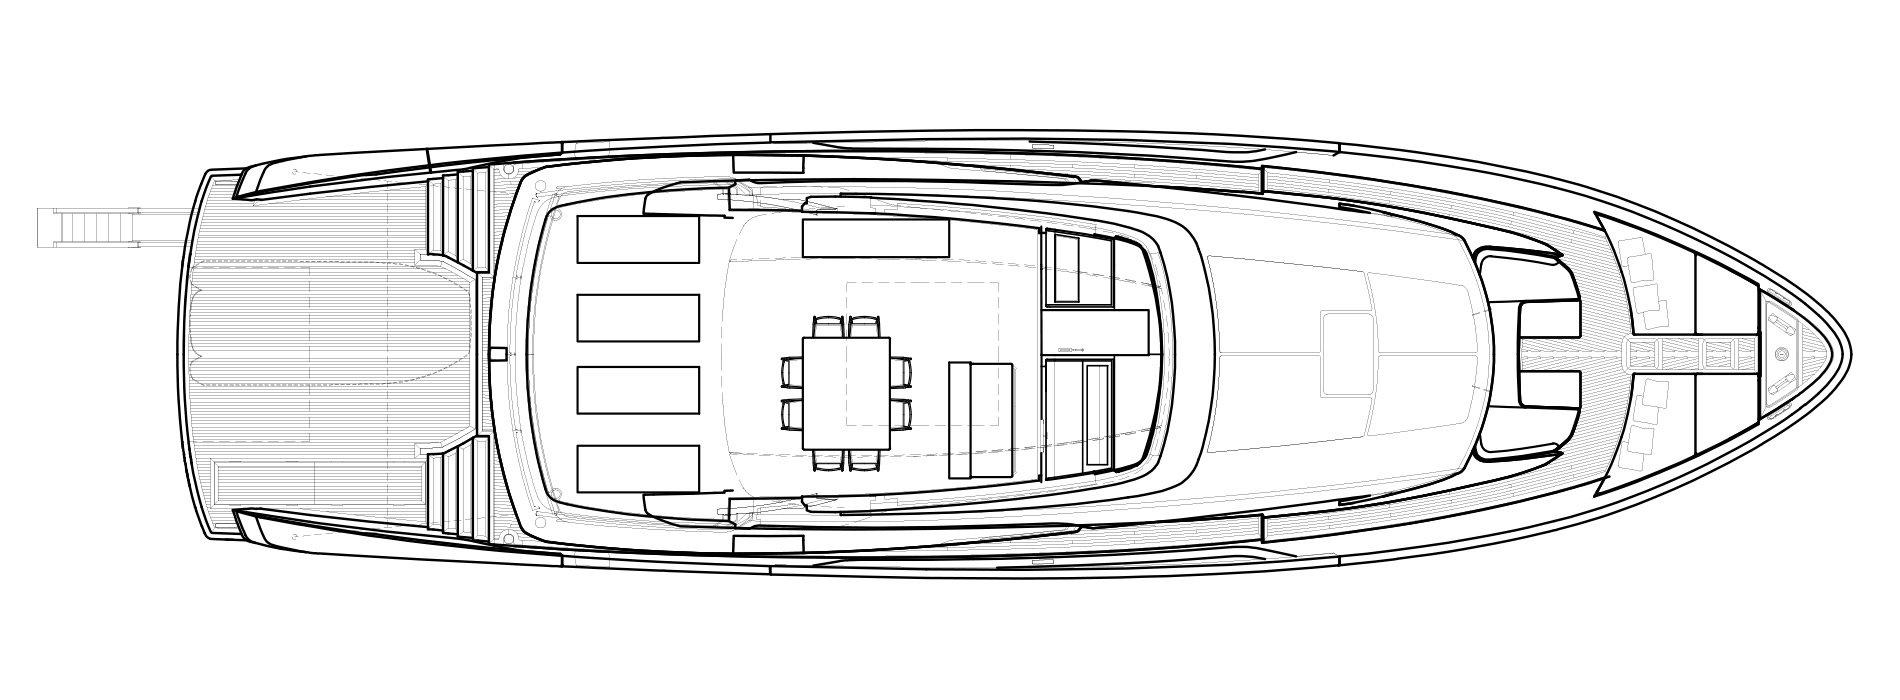 Sanlorenzo Yachts SX88 Flying bridge Versione B